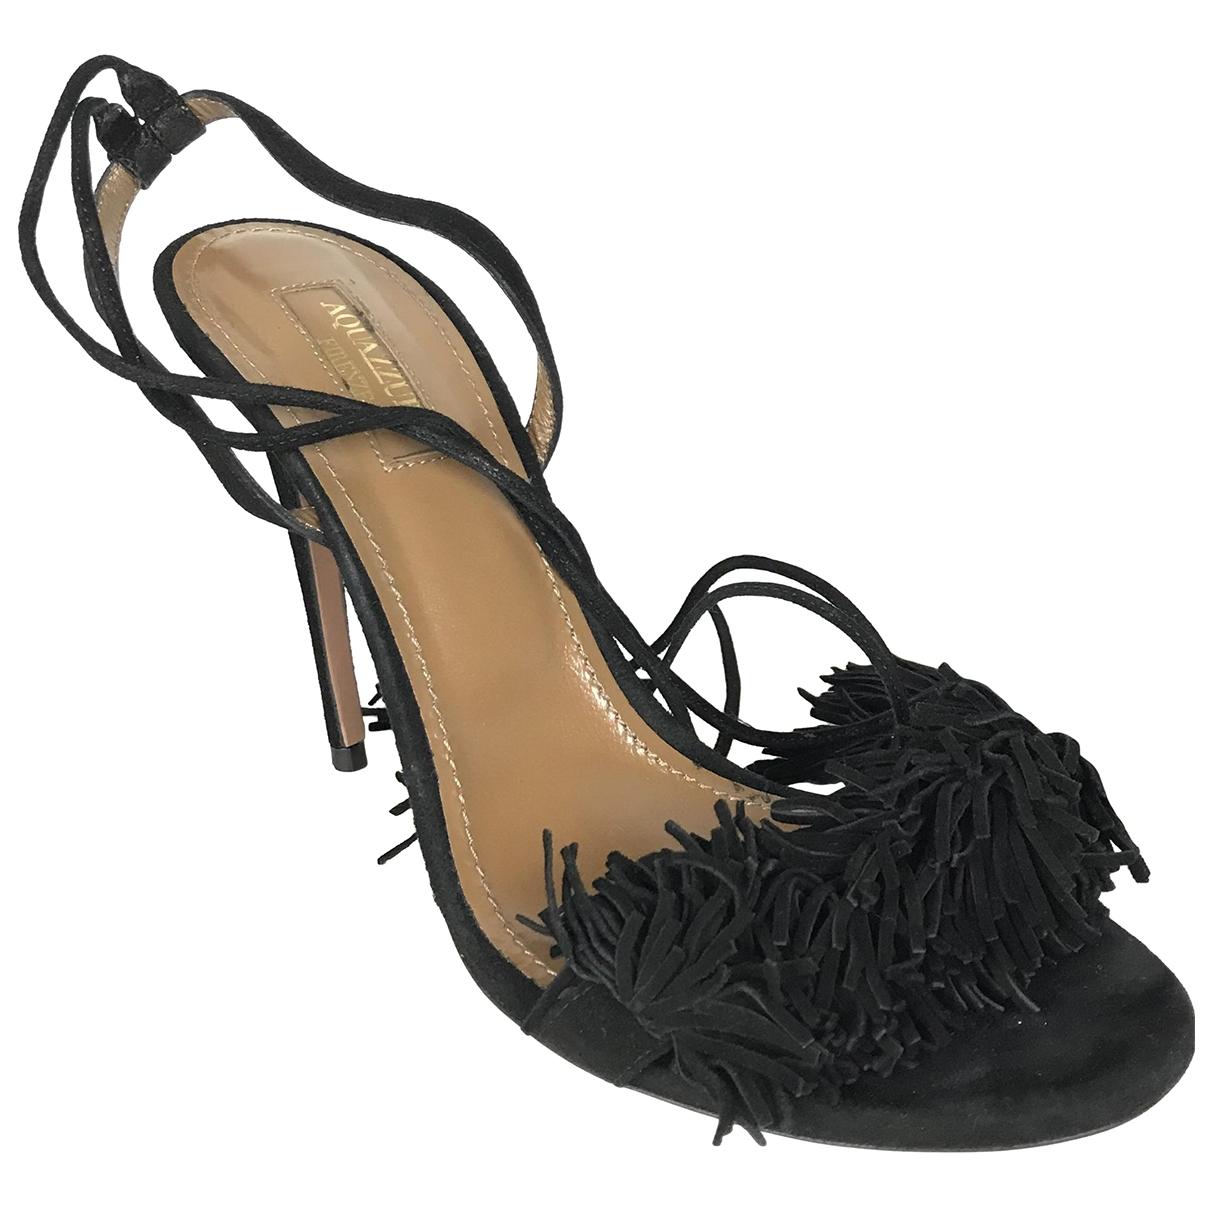 Aquazzura Wild Thing Black Suede Sandals for Women 38 EU